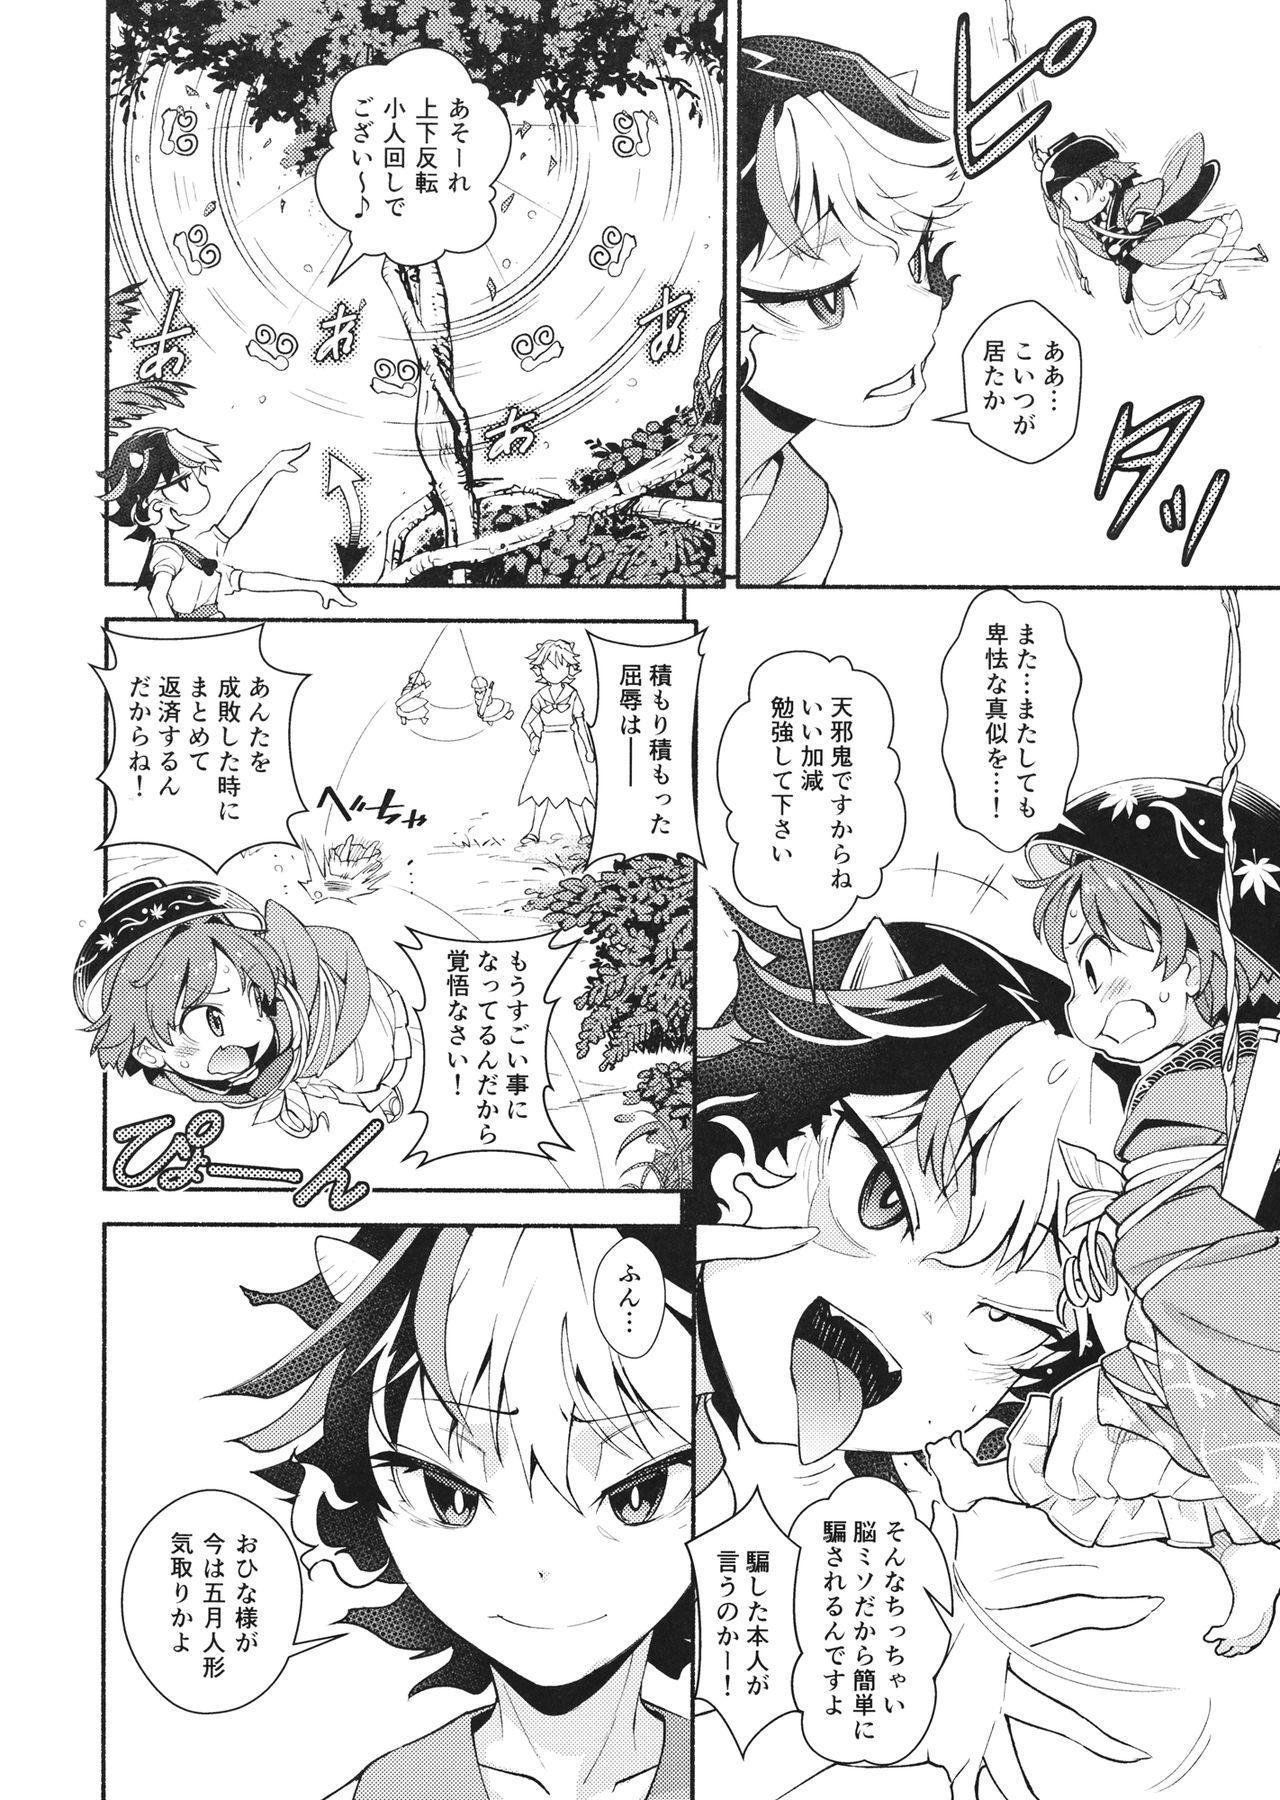 Touhou Amanojaku 4